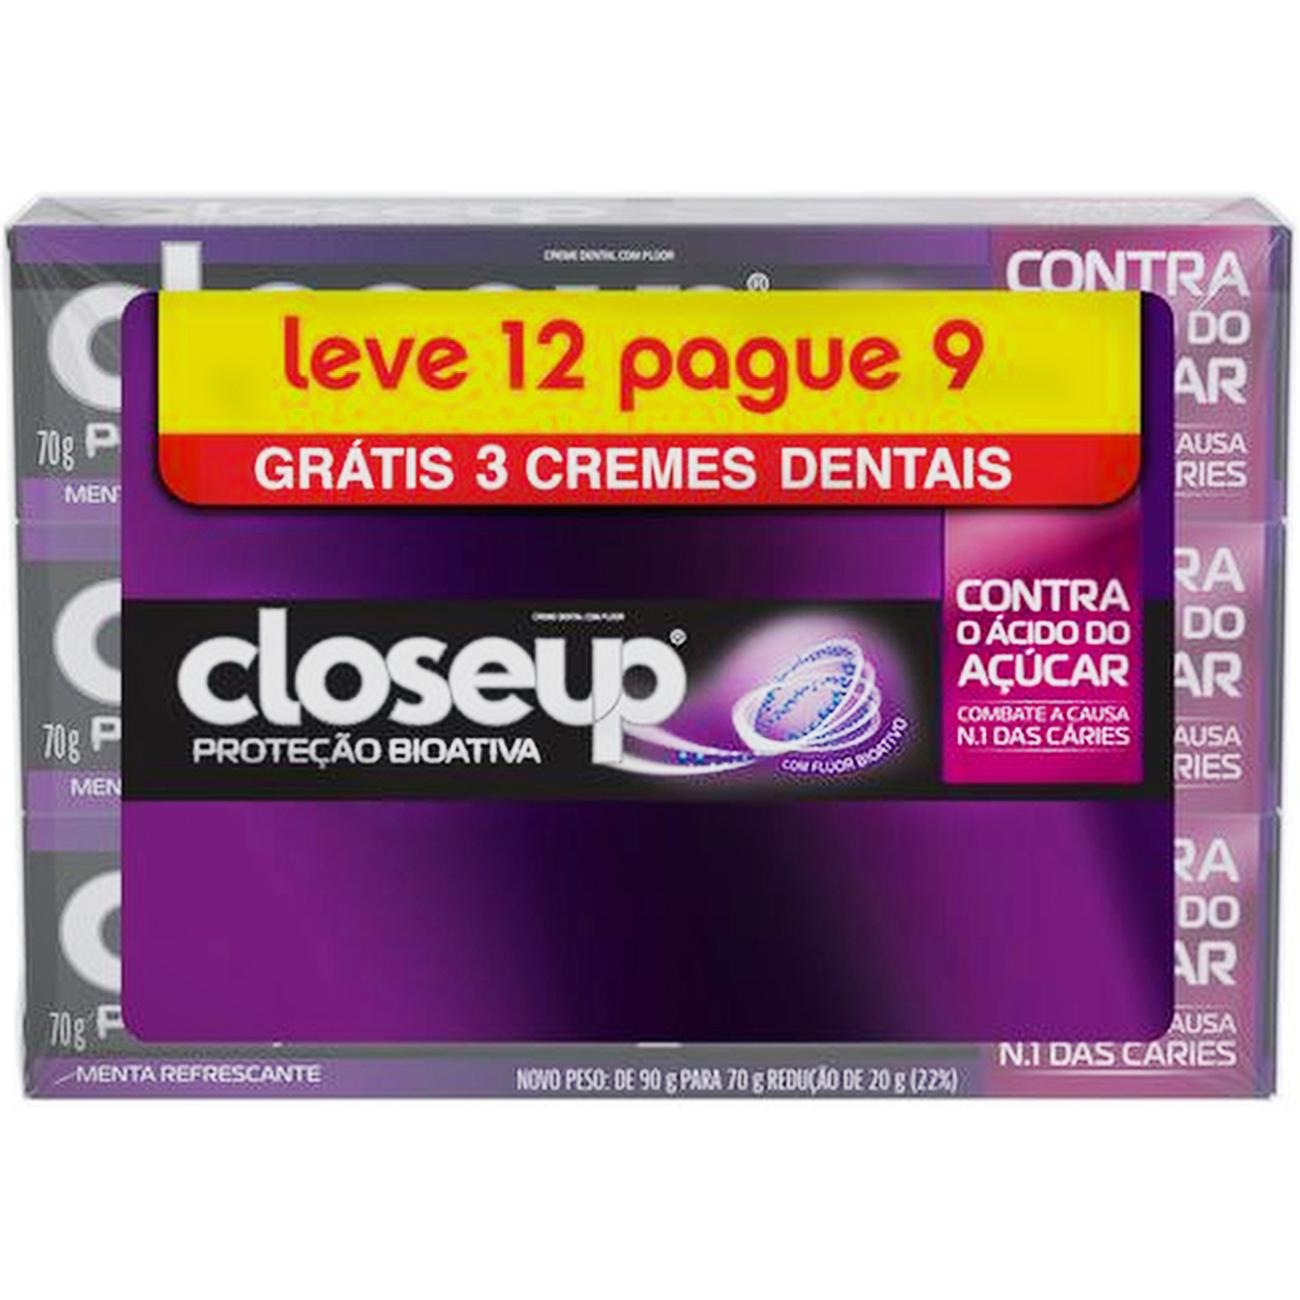 Creme Dental Close Up Protecao Bioativa leve 12 pague 9 70g